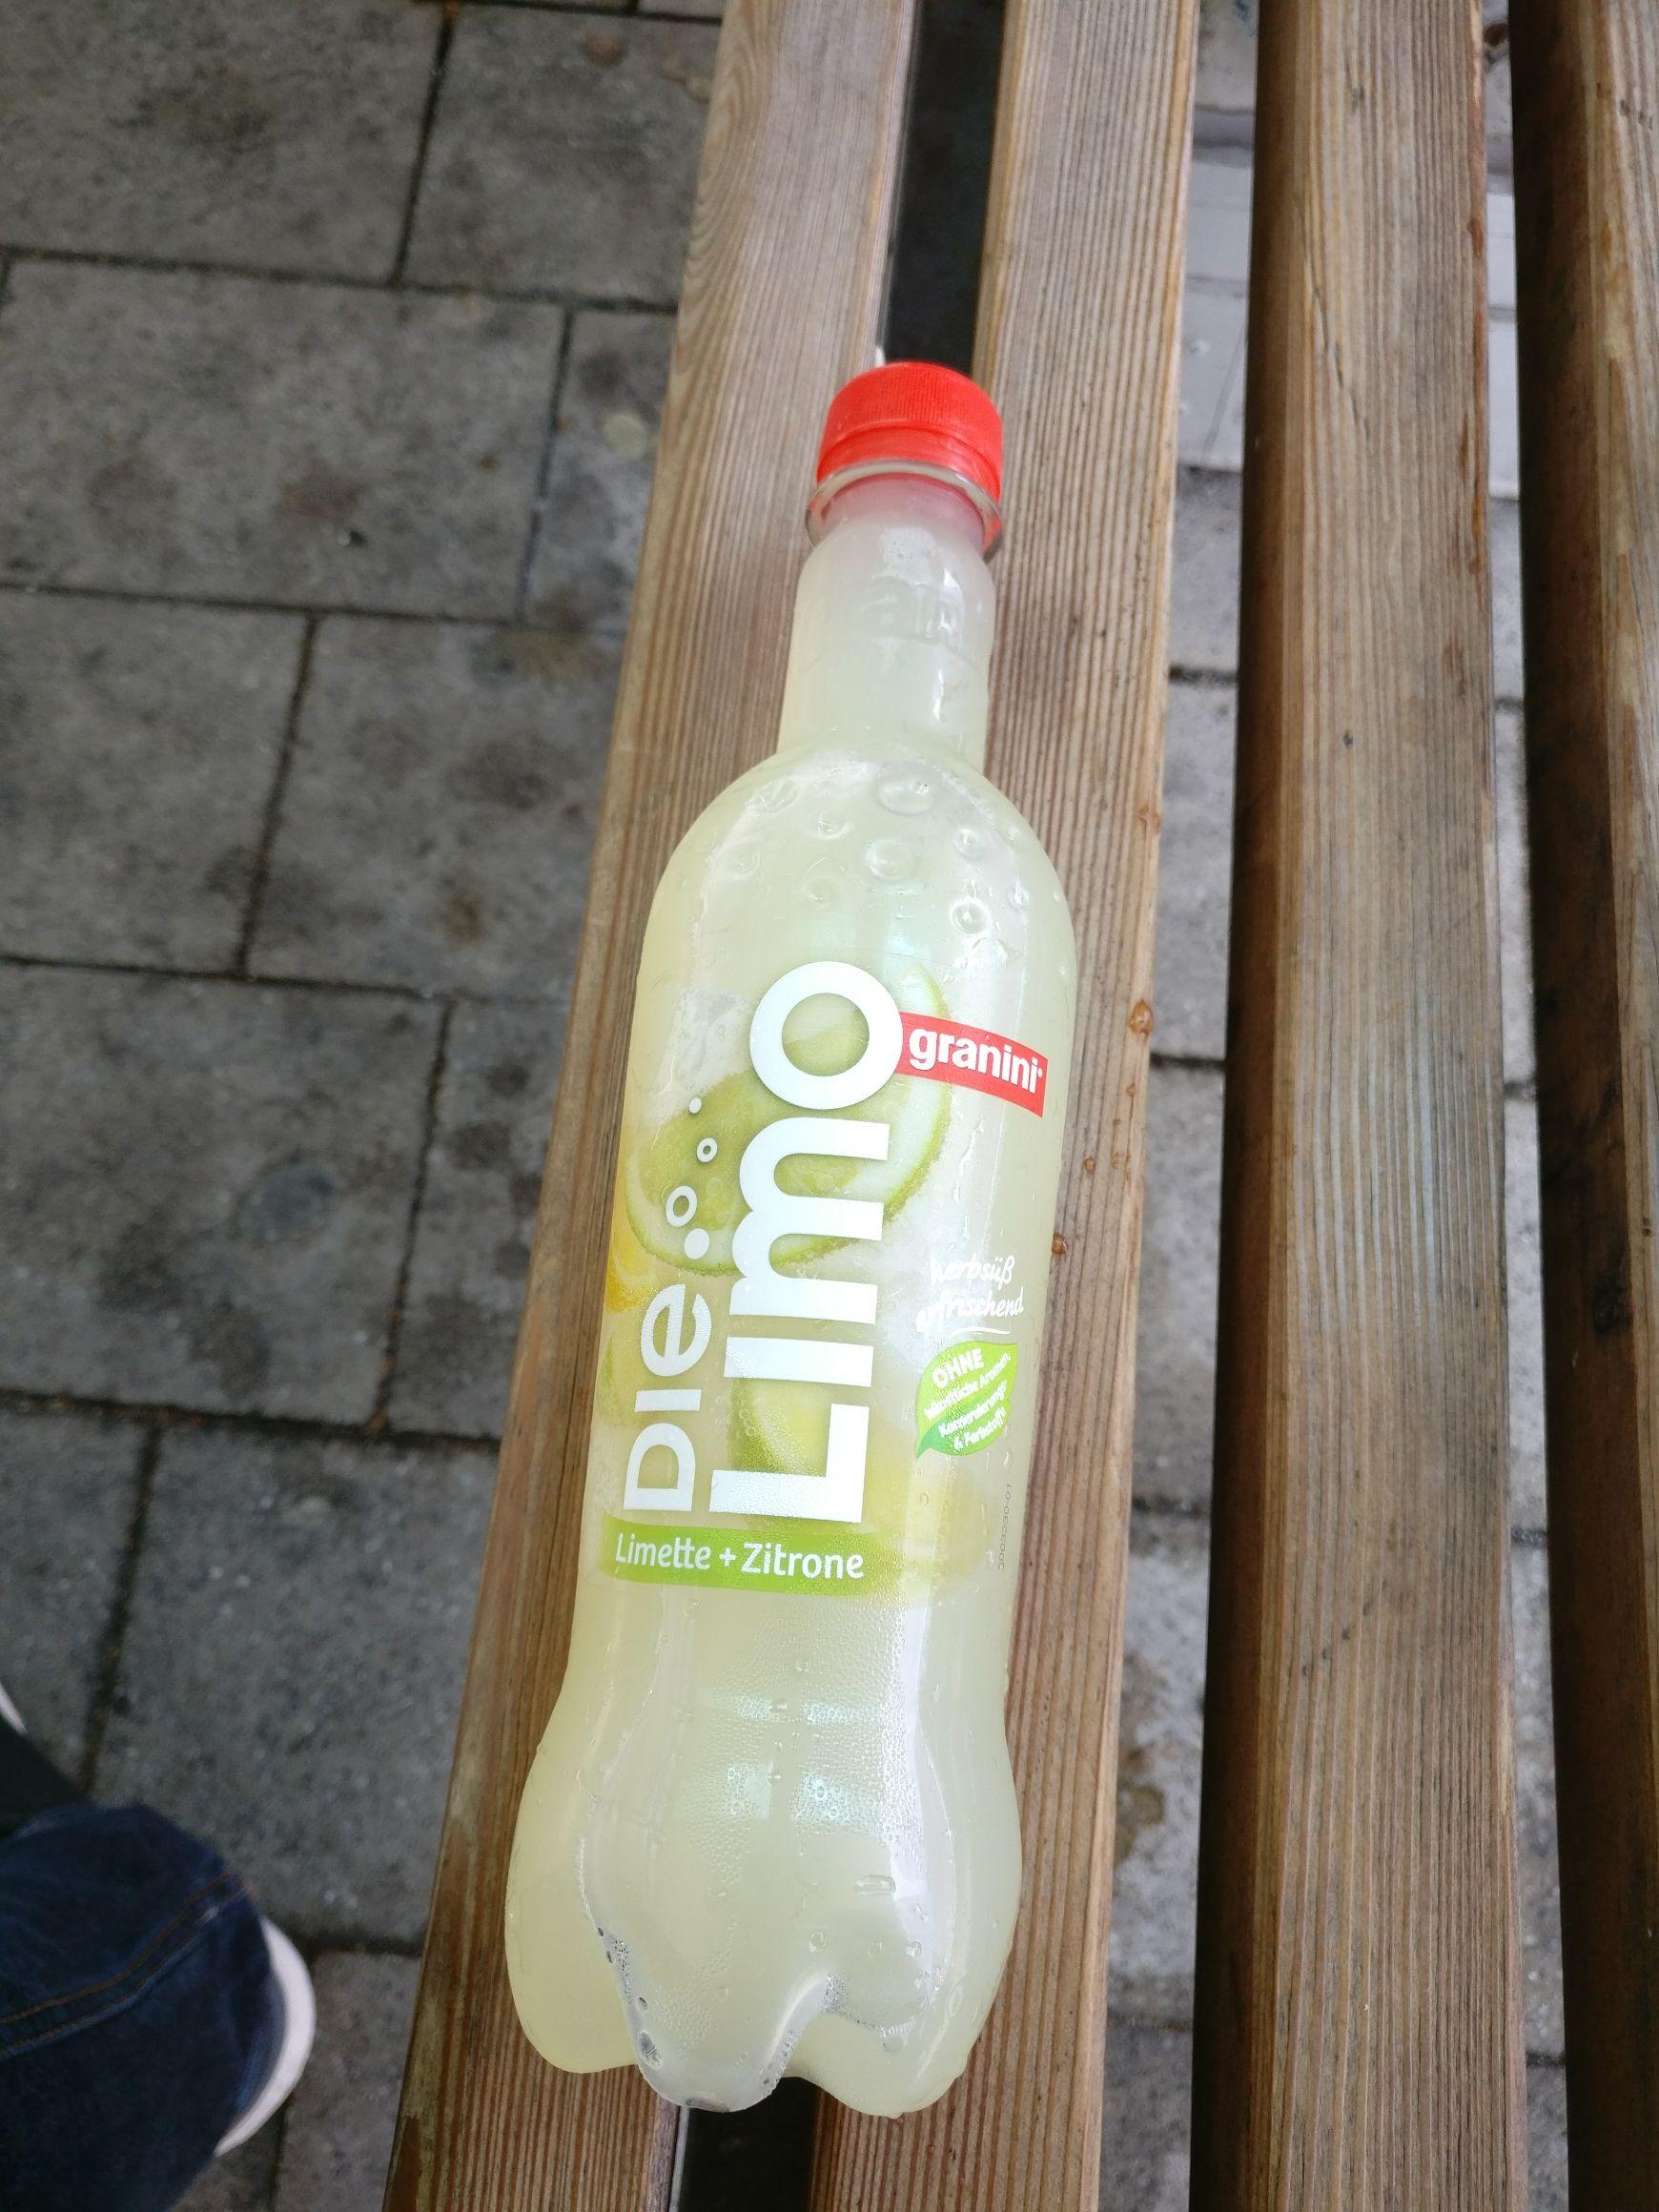 [LOKAL HB] [25ct GEWINN] Uni bremen gratis 0,5er die Limo Limette + Zitrone